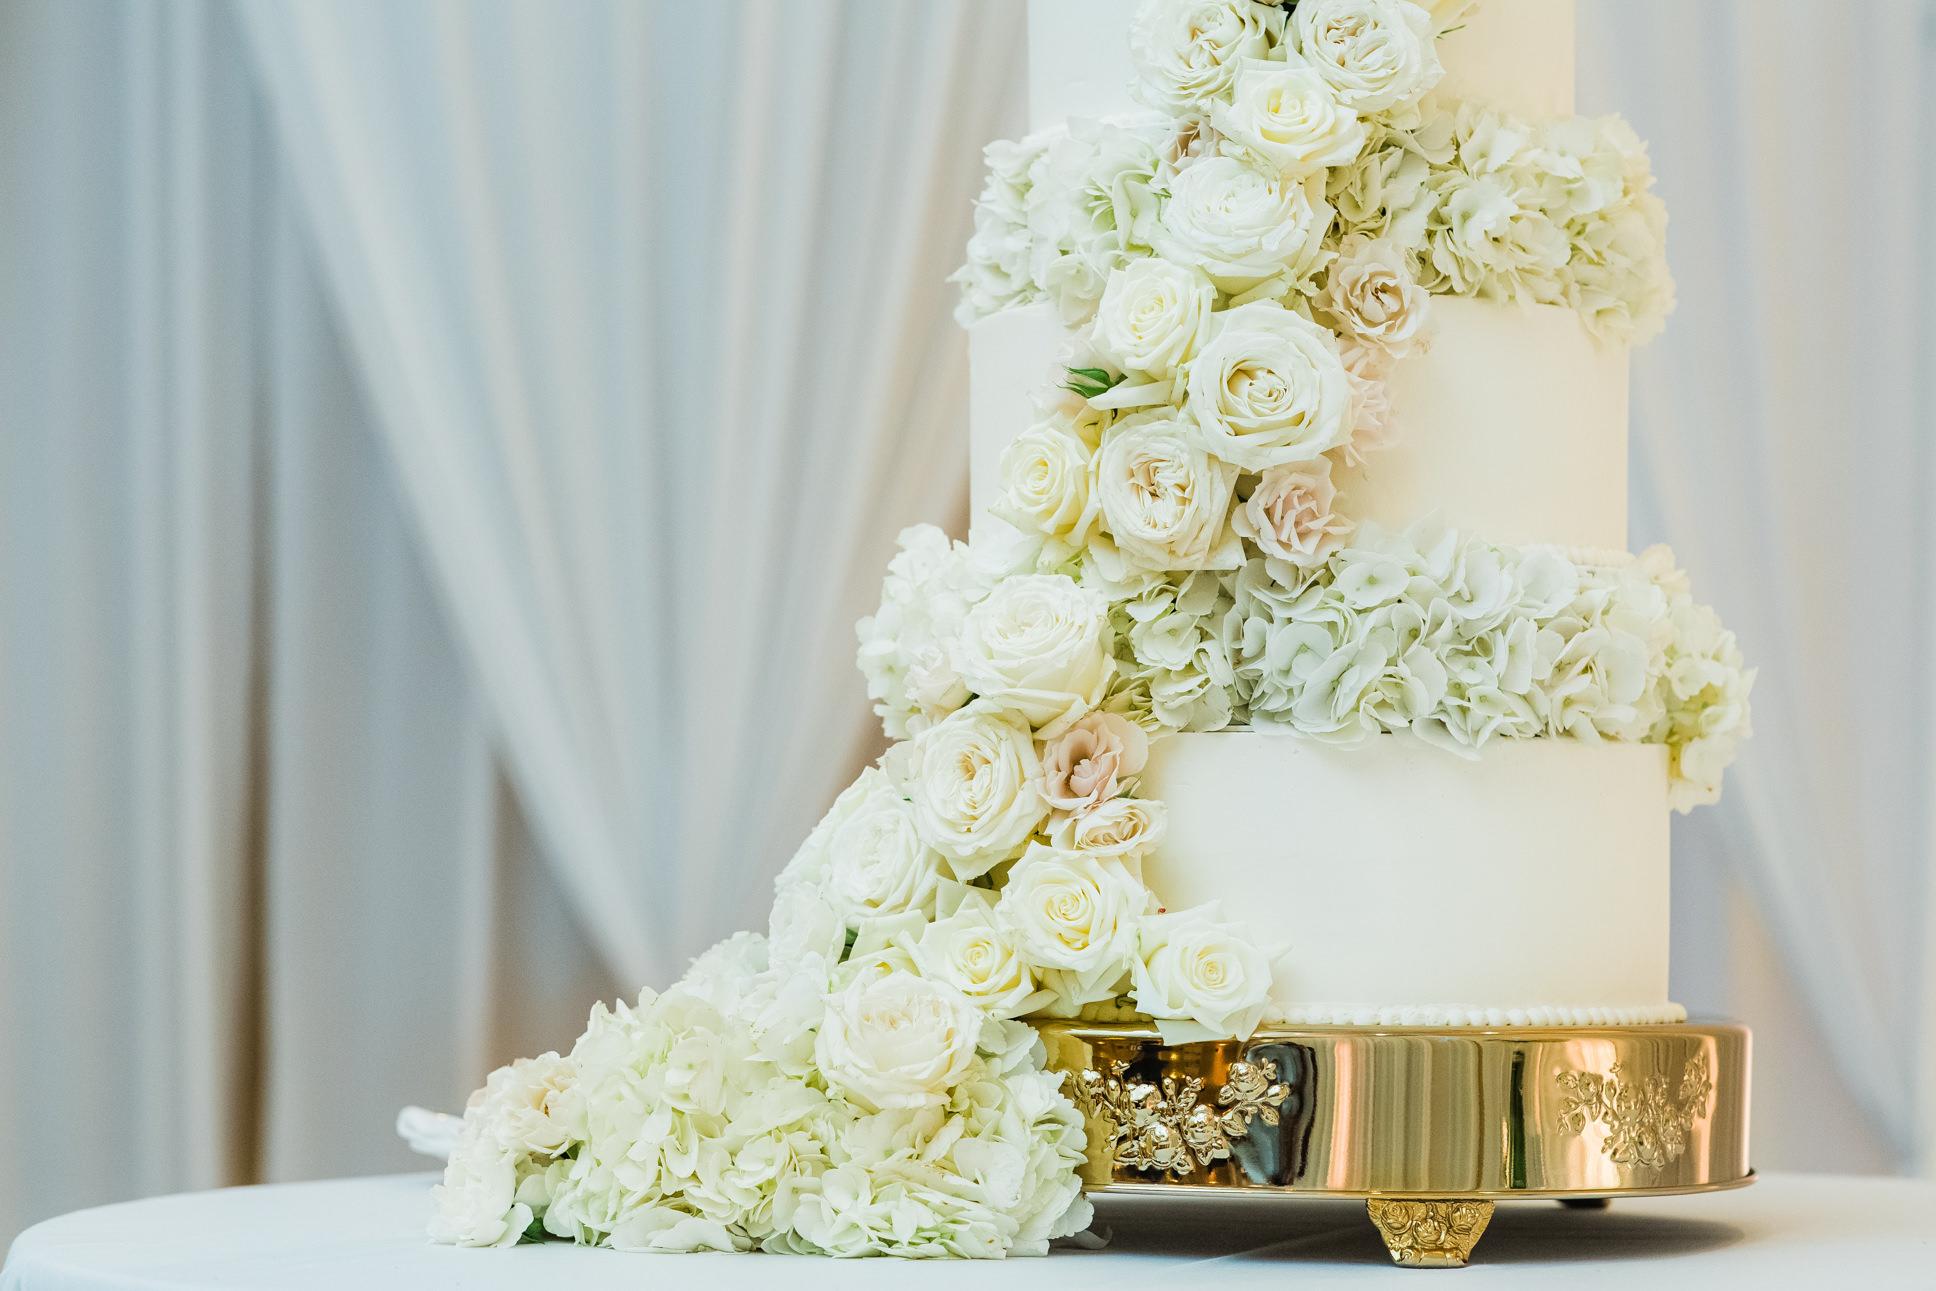 Classic Elegant White Wedding Cake with Lush Cascading White Hydrangeas, Ivory and Blush Pink Roses   Wedding Caterer and Cake St. Pete Vinoy Renaissance